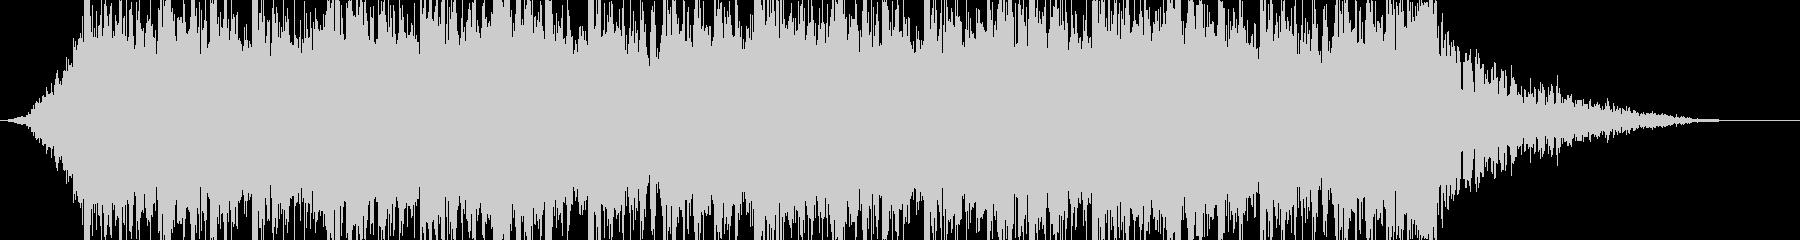 Hollywood Orchestra 3の未再生の波形